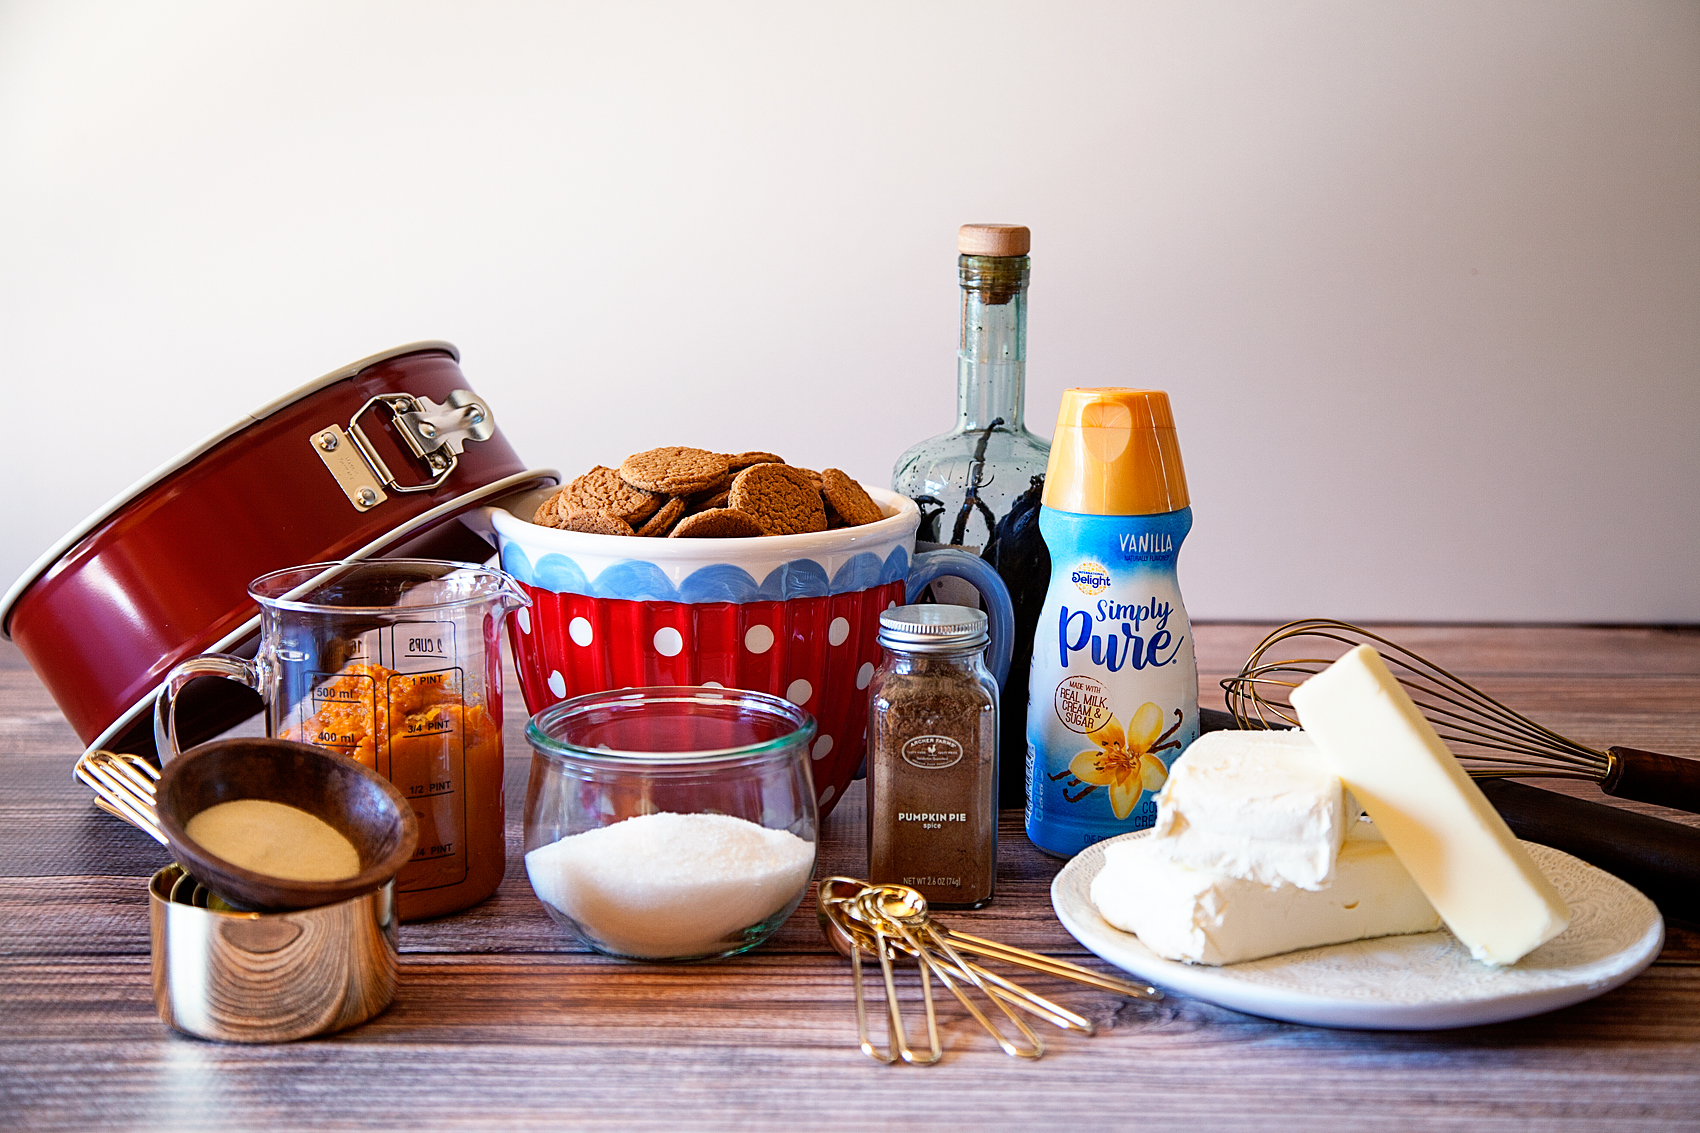 No-Bake Pumpkin Cheesecake with International Delights Simply Pure Vanilla